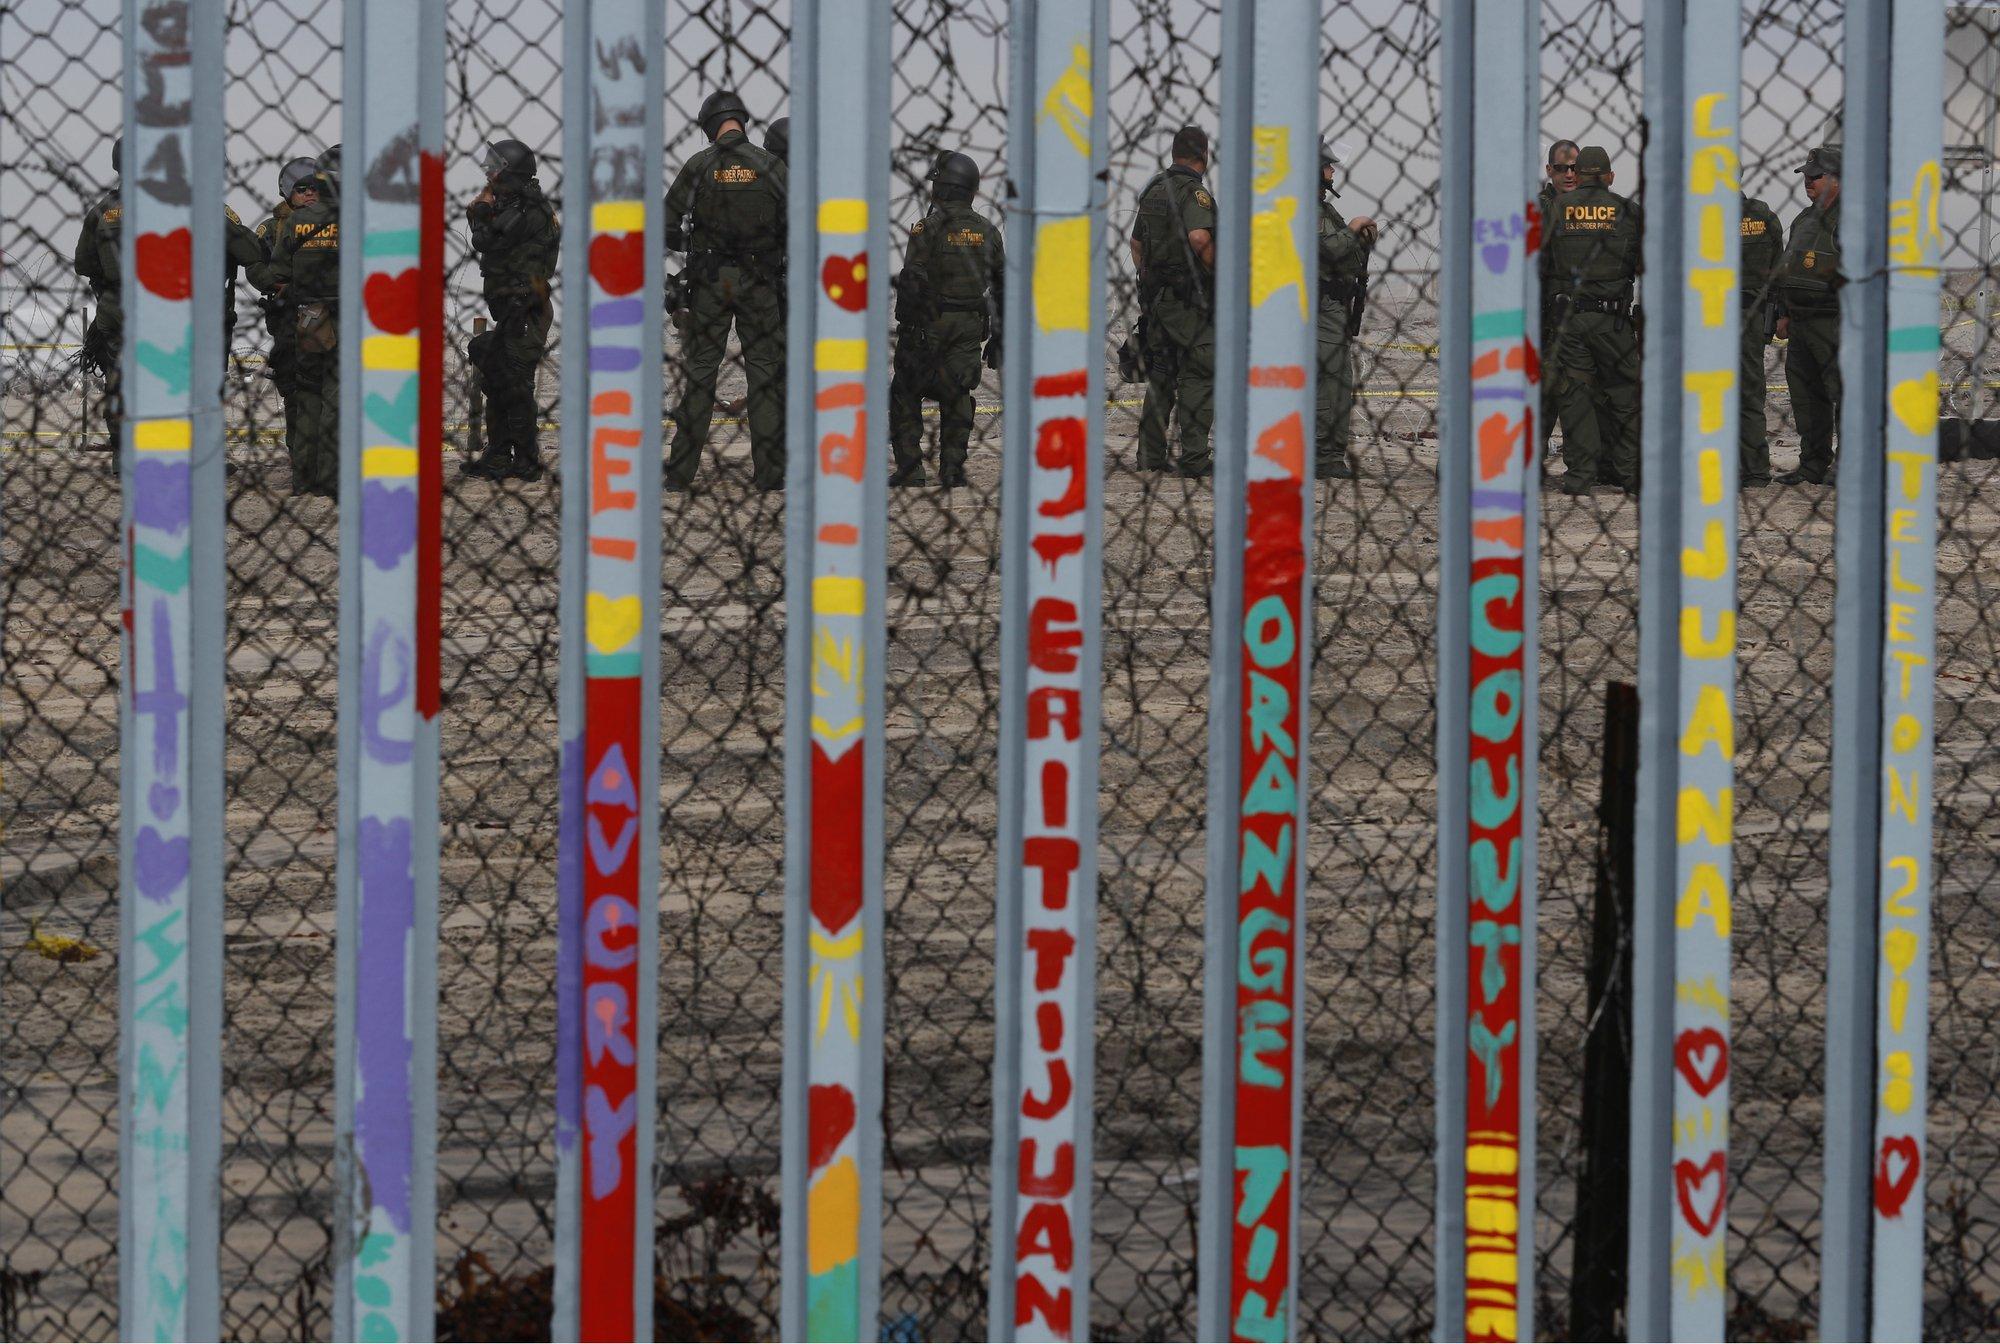 Trump to meet with Democrats on border wall, shutdown